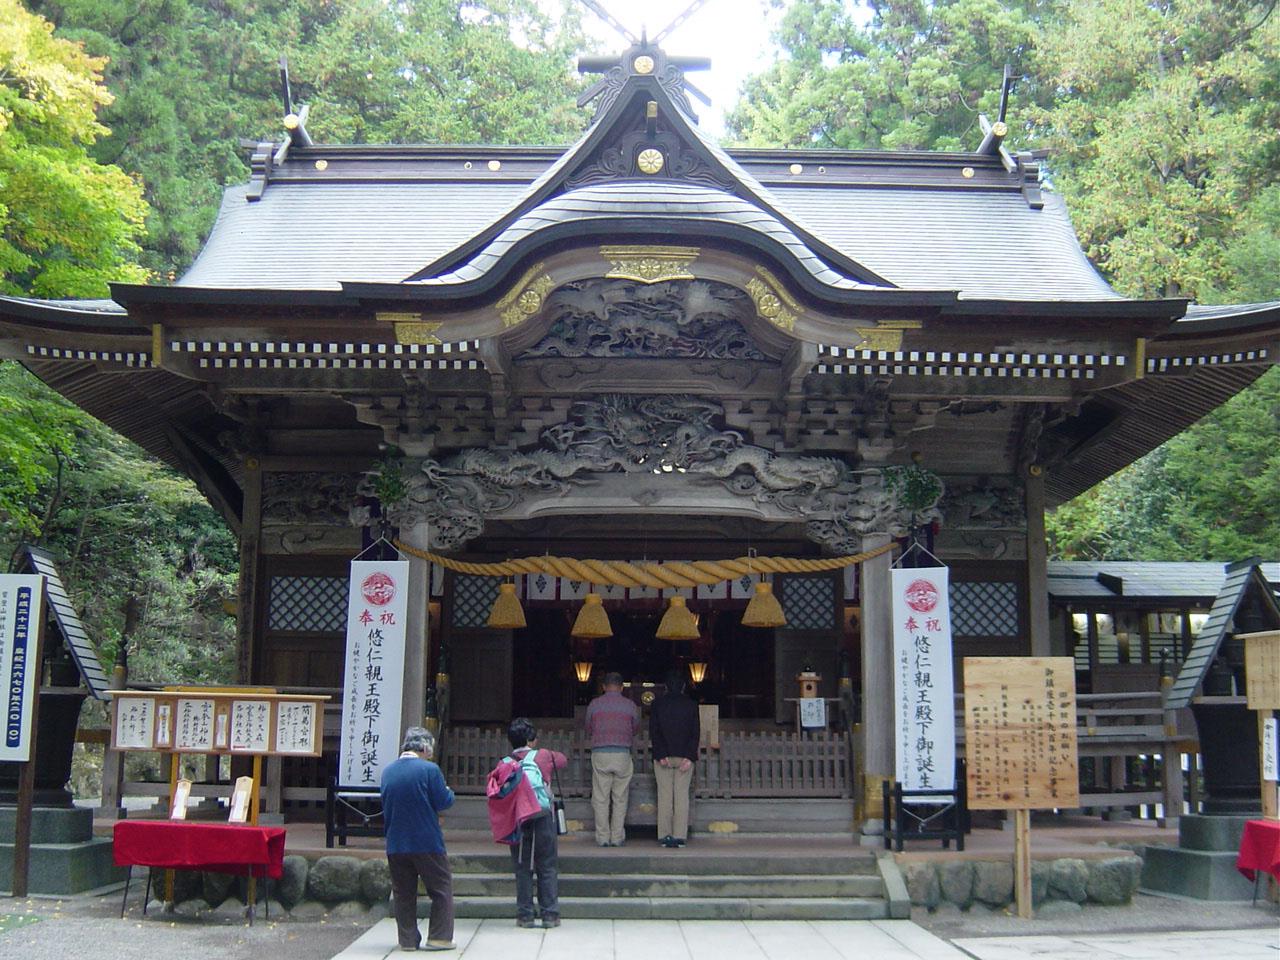 宝登山神社 - Wikipedia